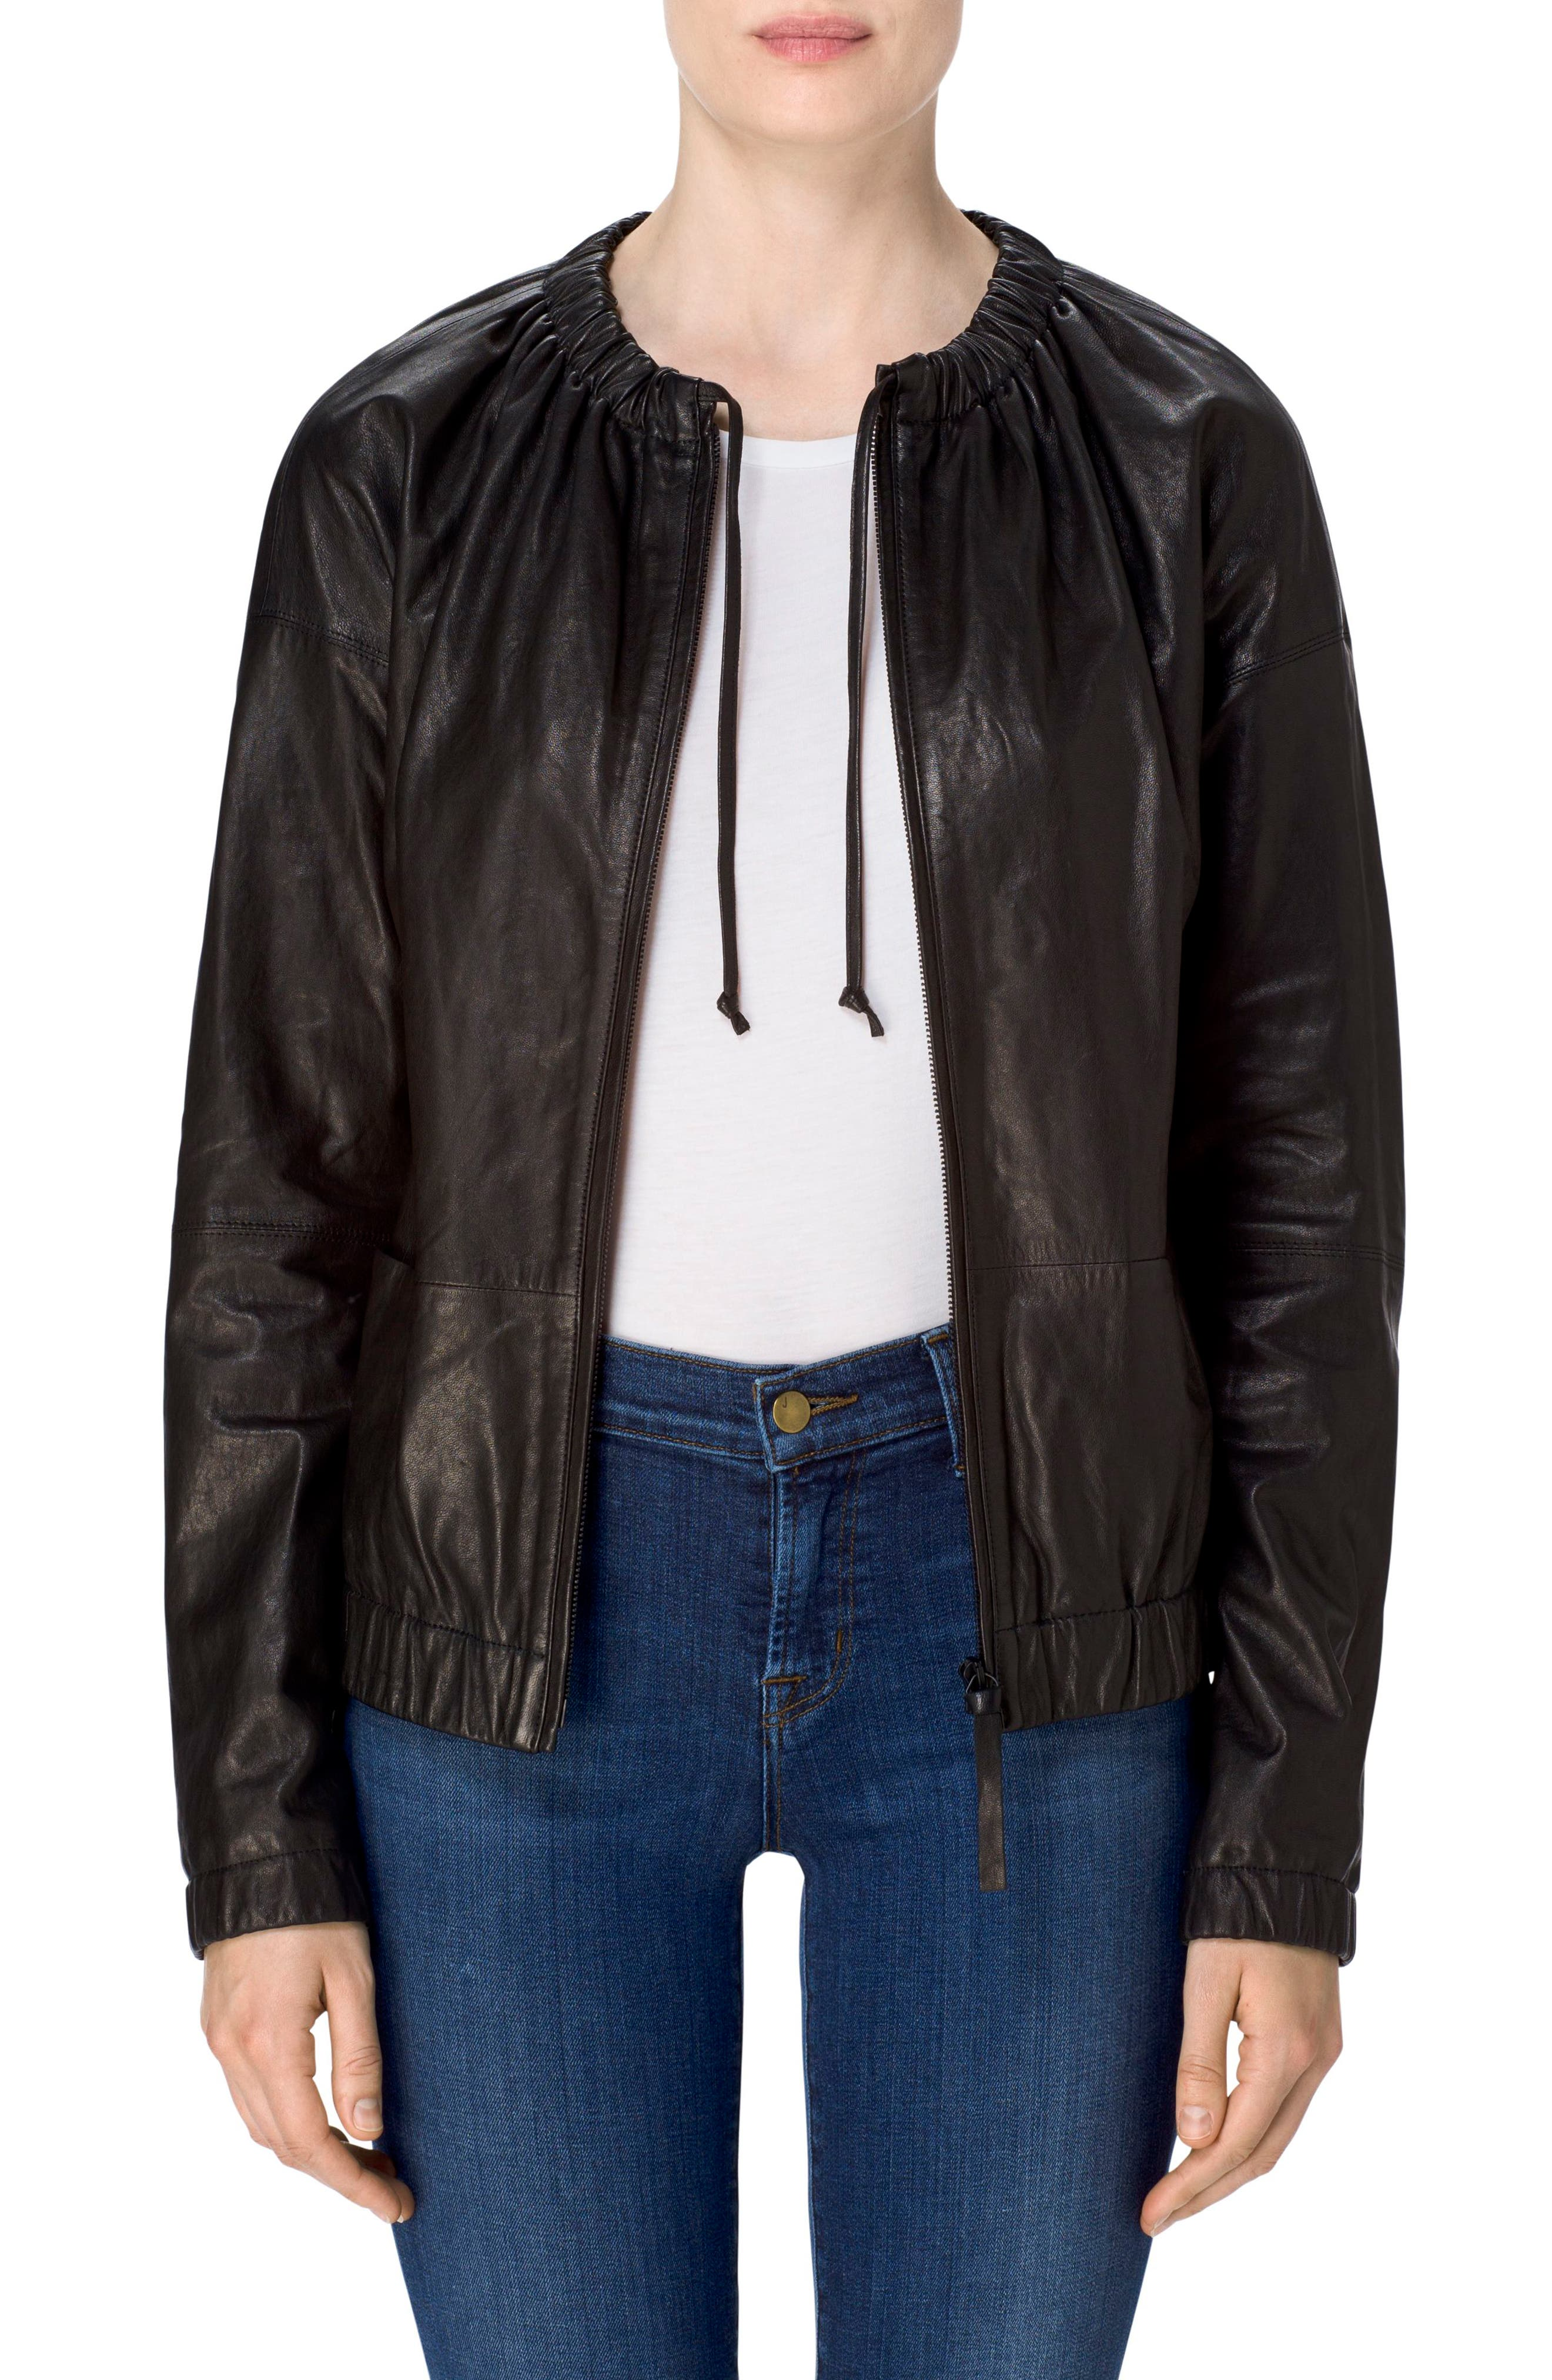 Baez Leather Bomber Jacket,                         Main,                         color, Black